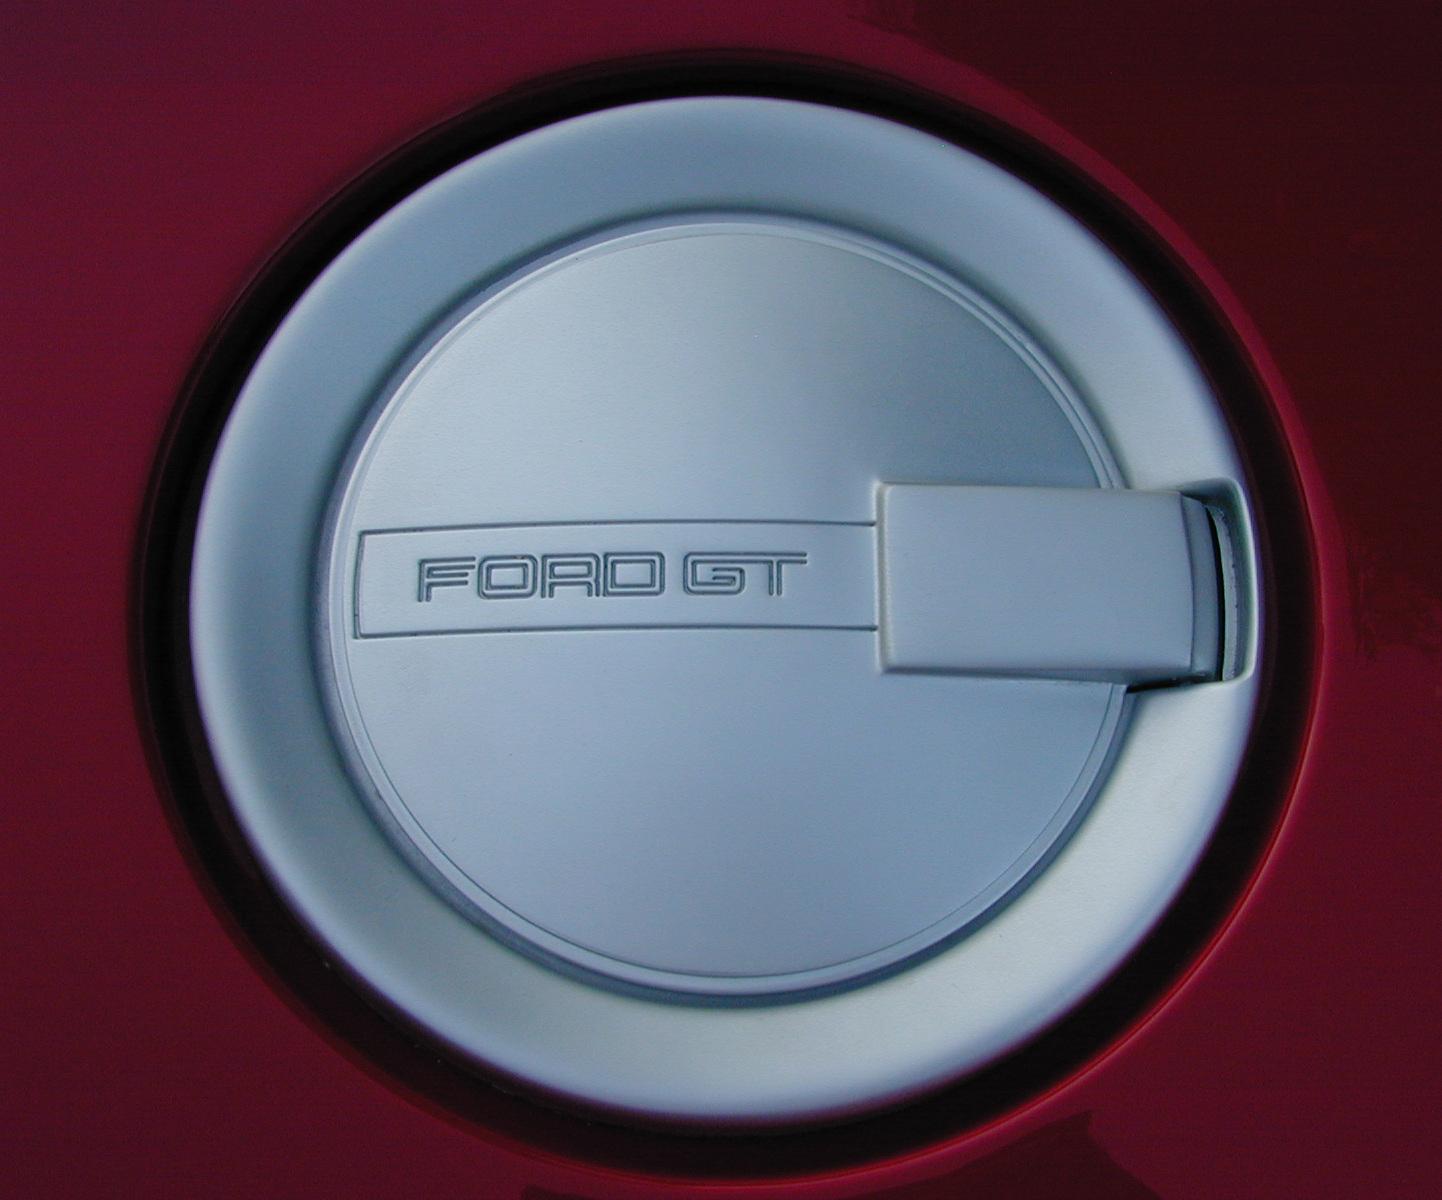 Prototype Ford GT Fuel Cap